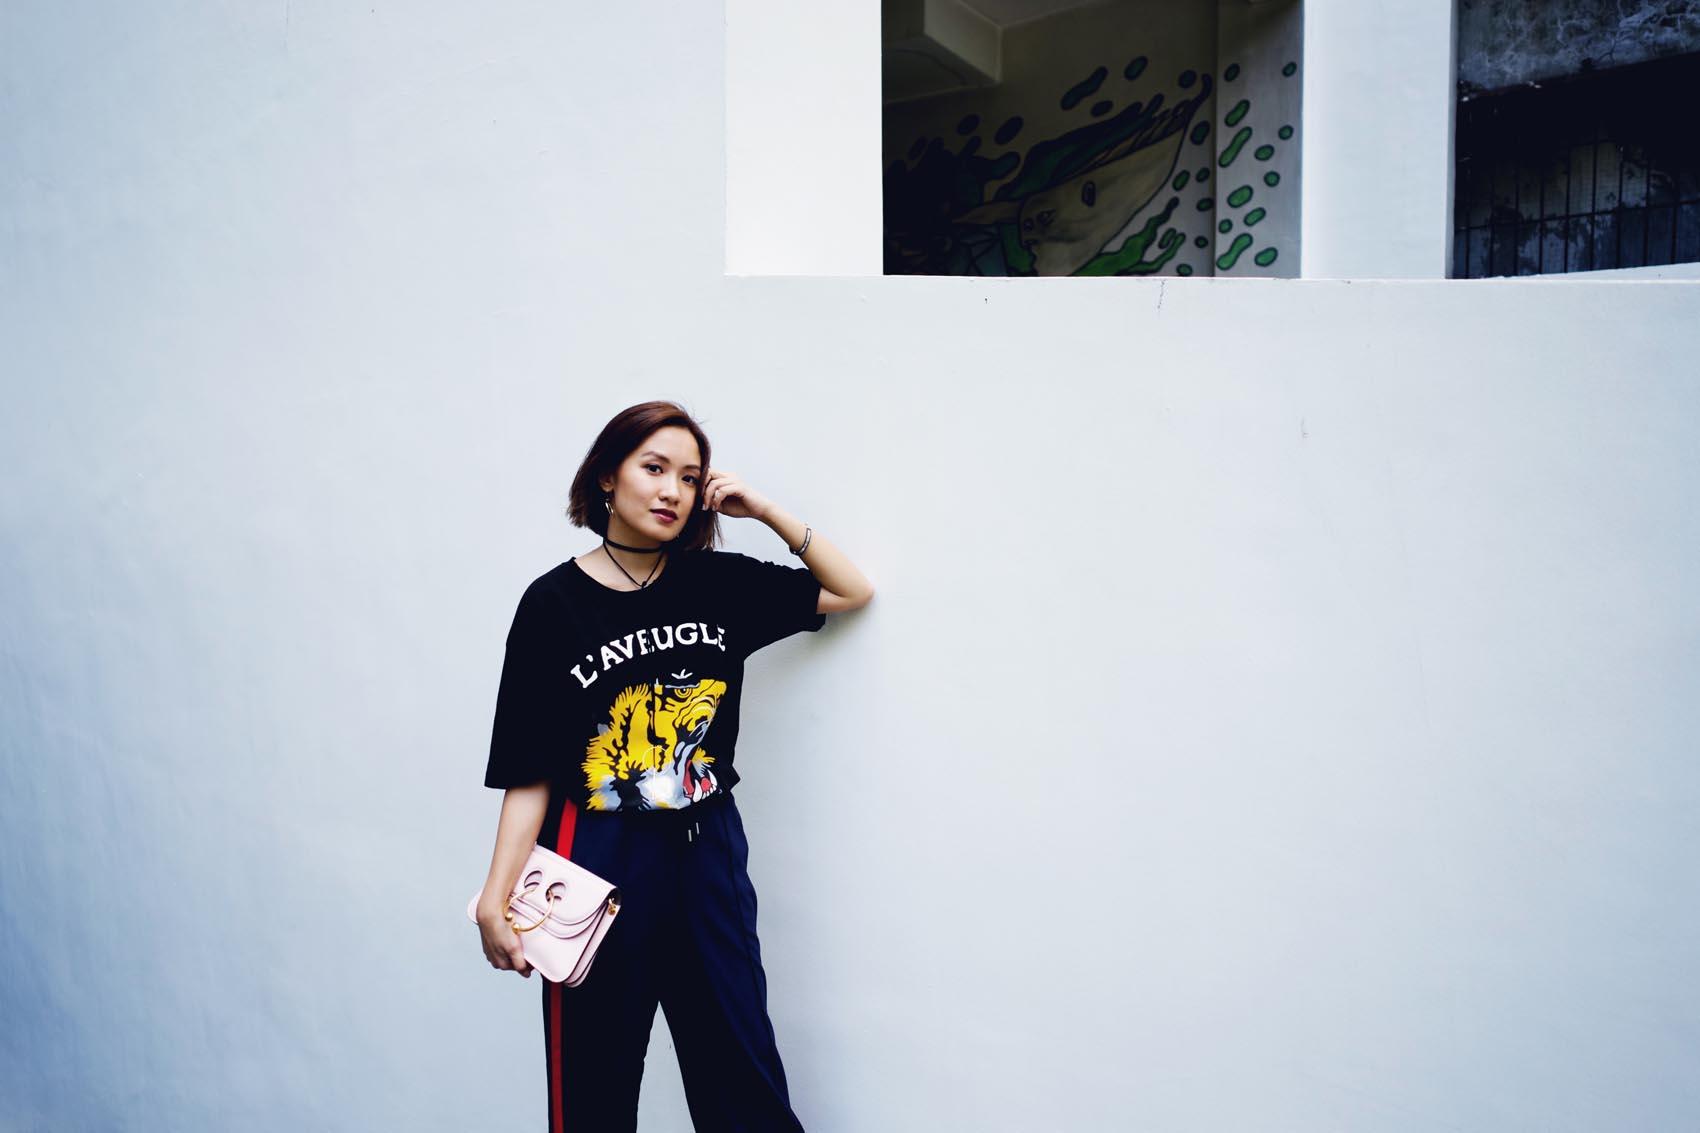 Gucci shirt street style 1